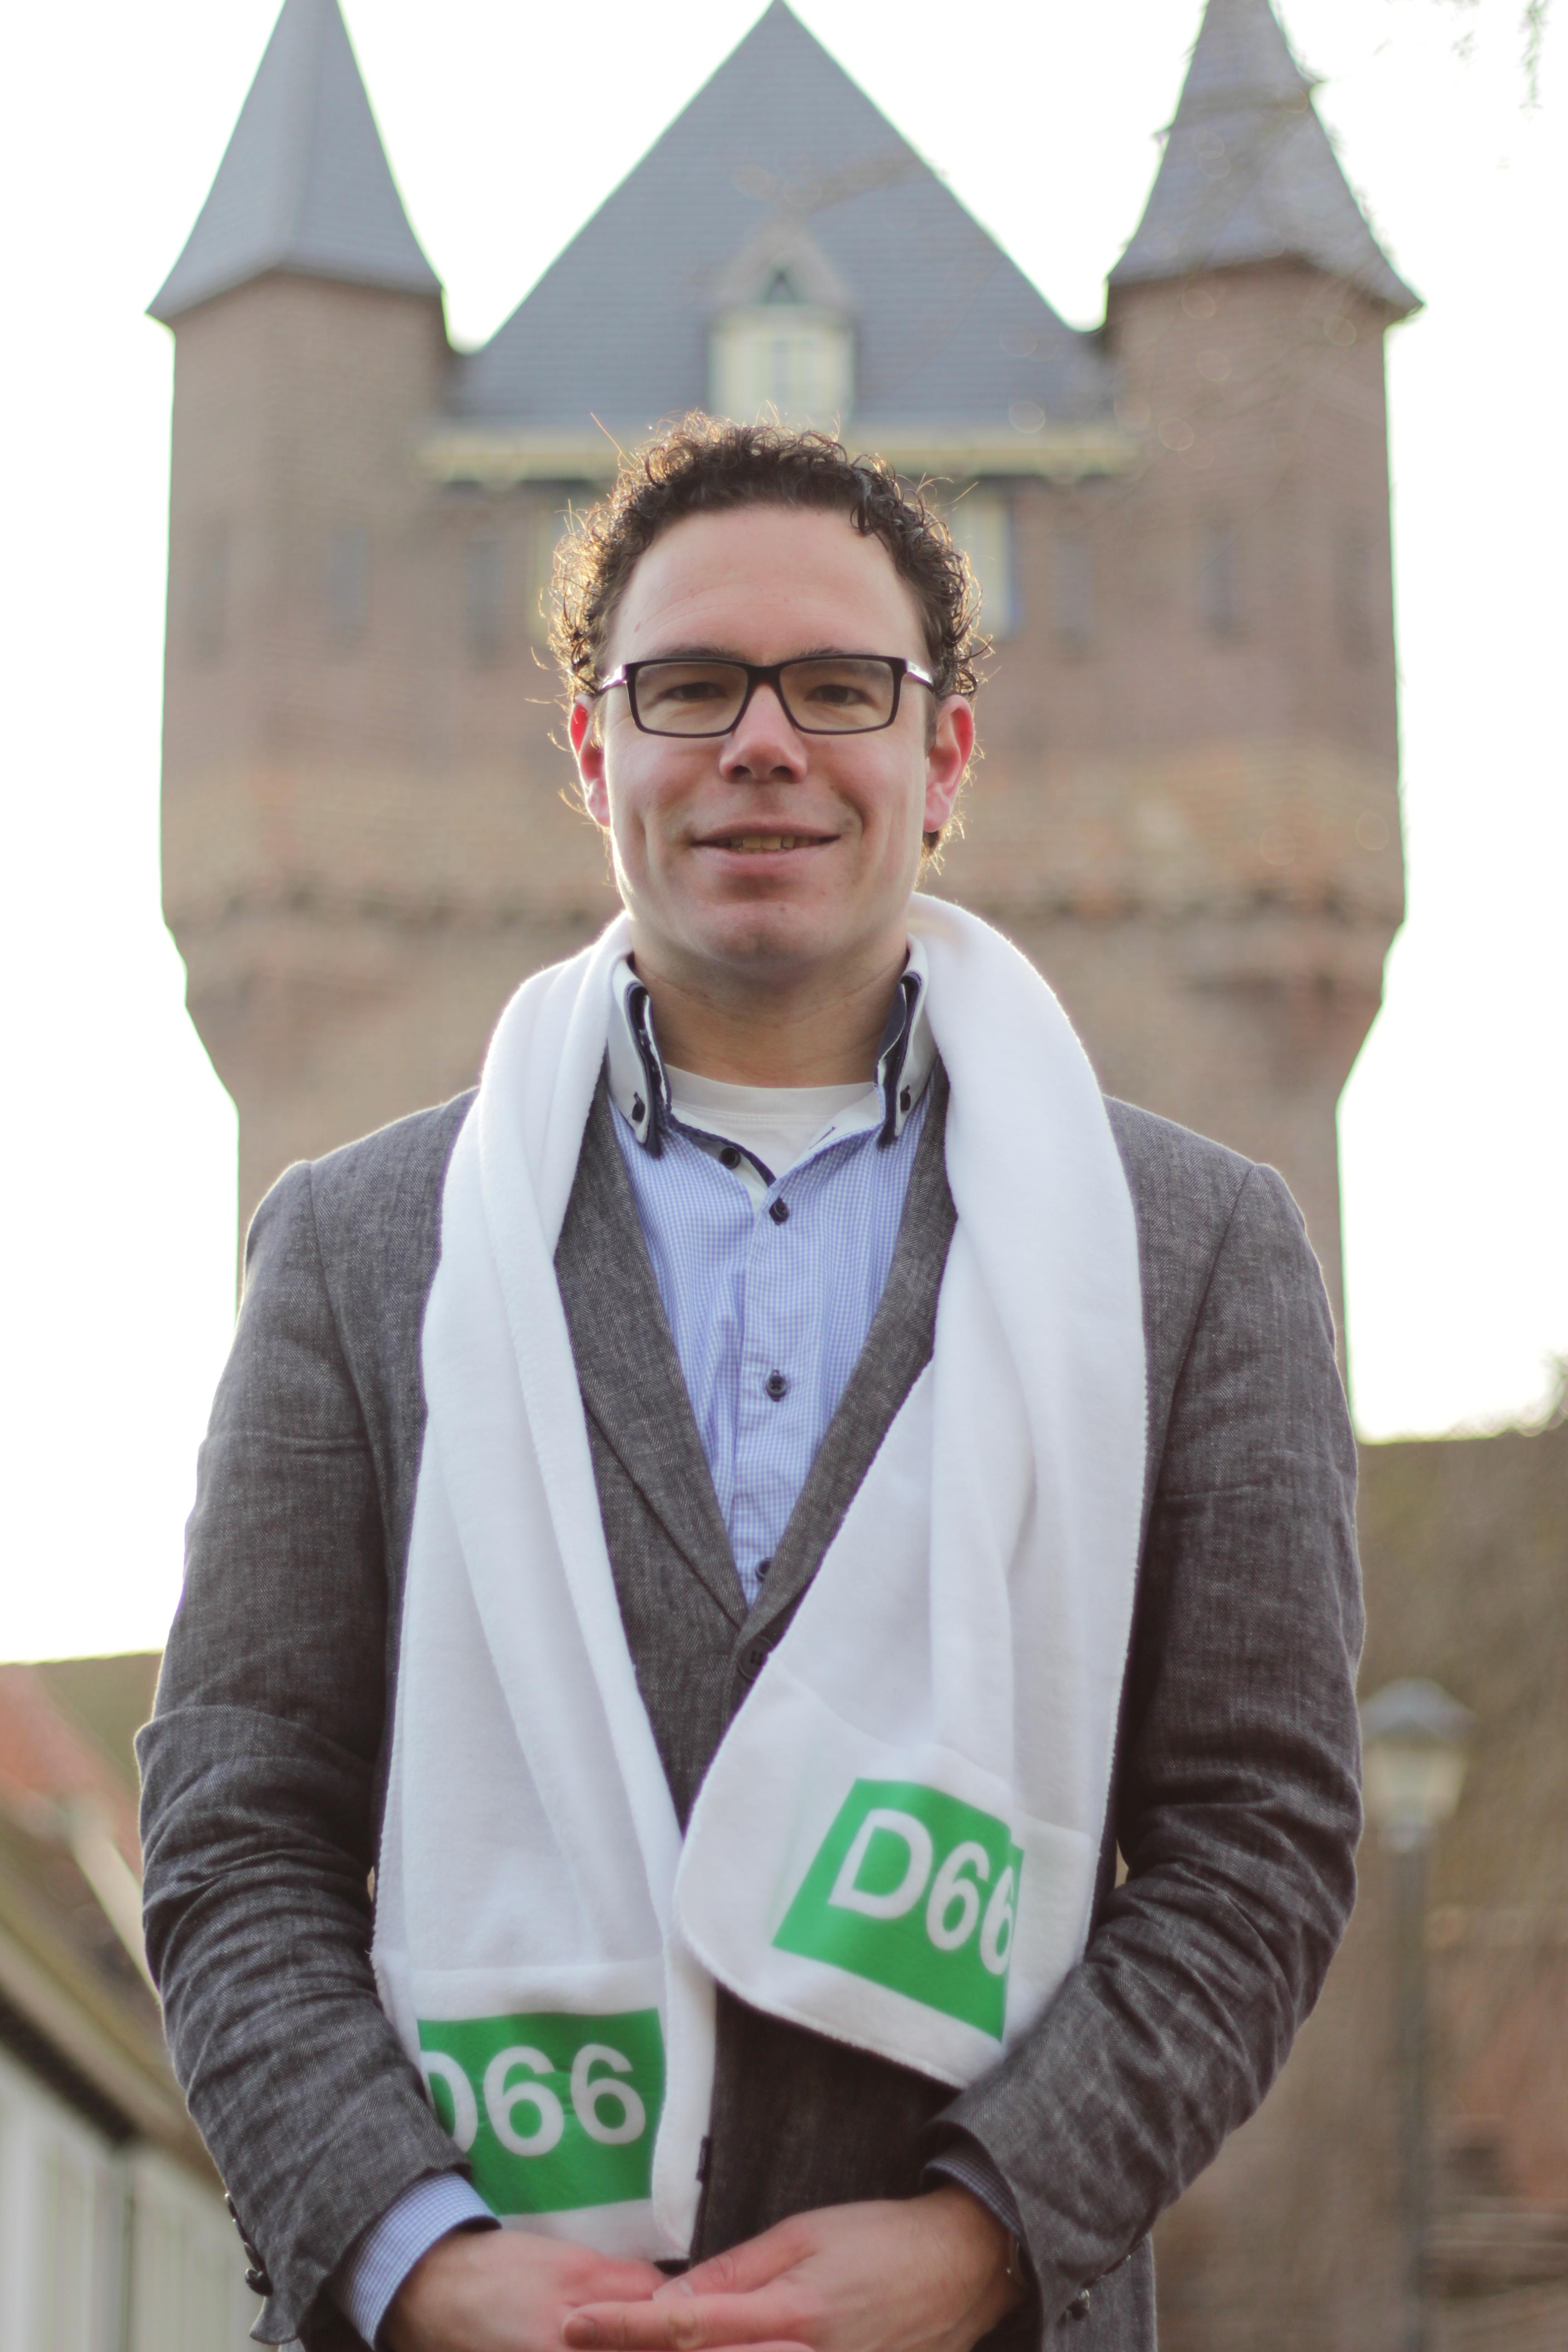 Jan Evert Drenth